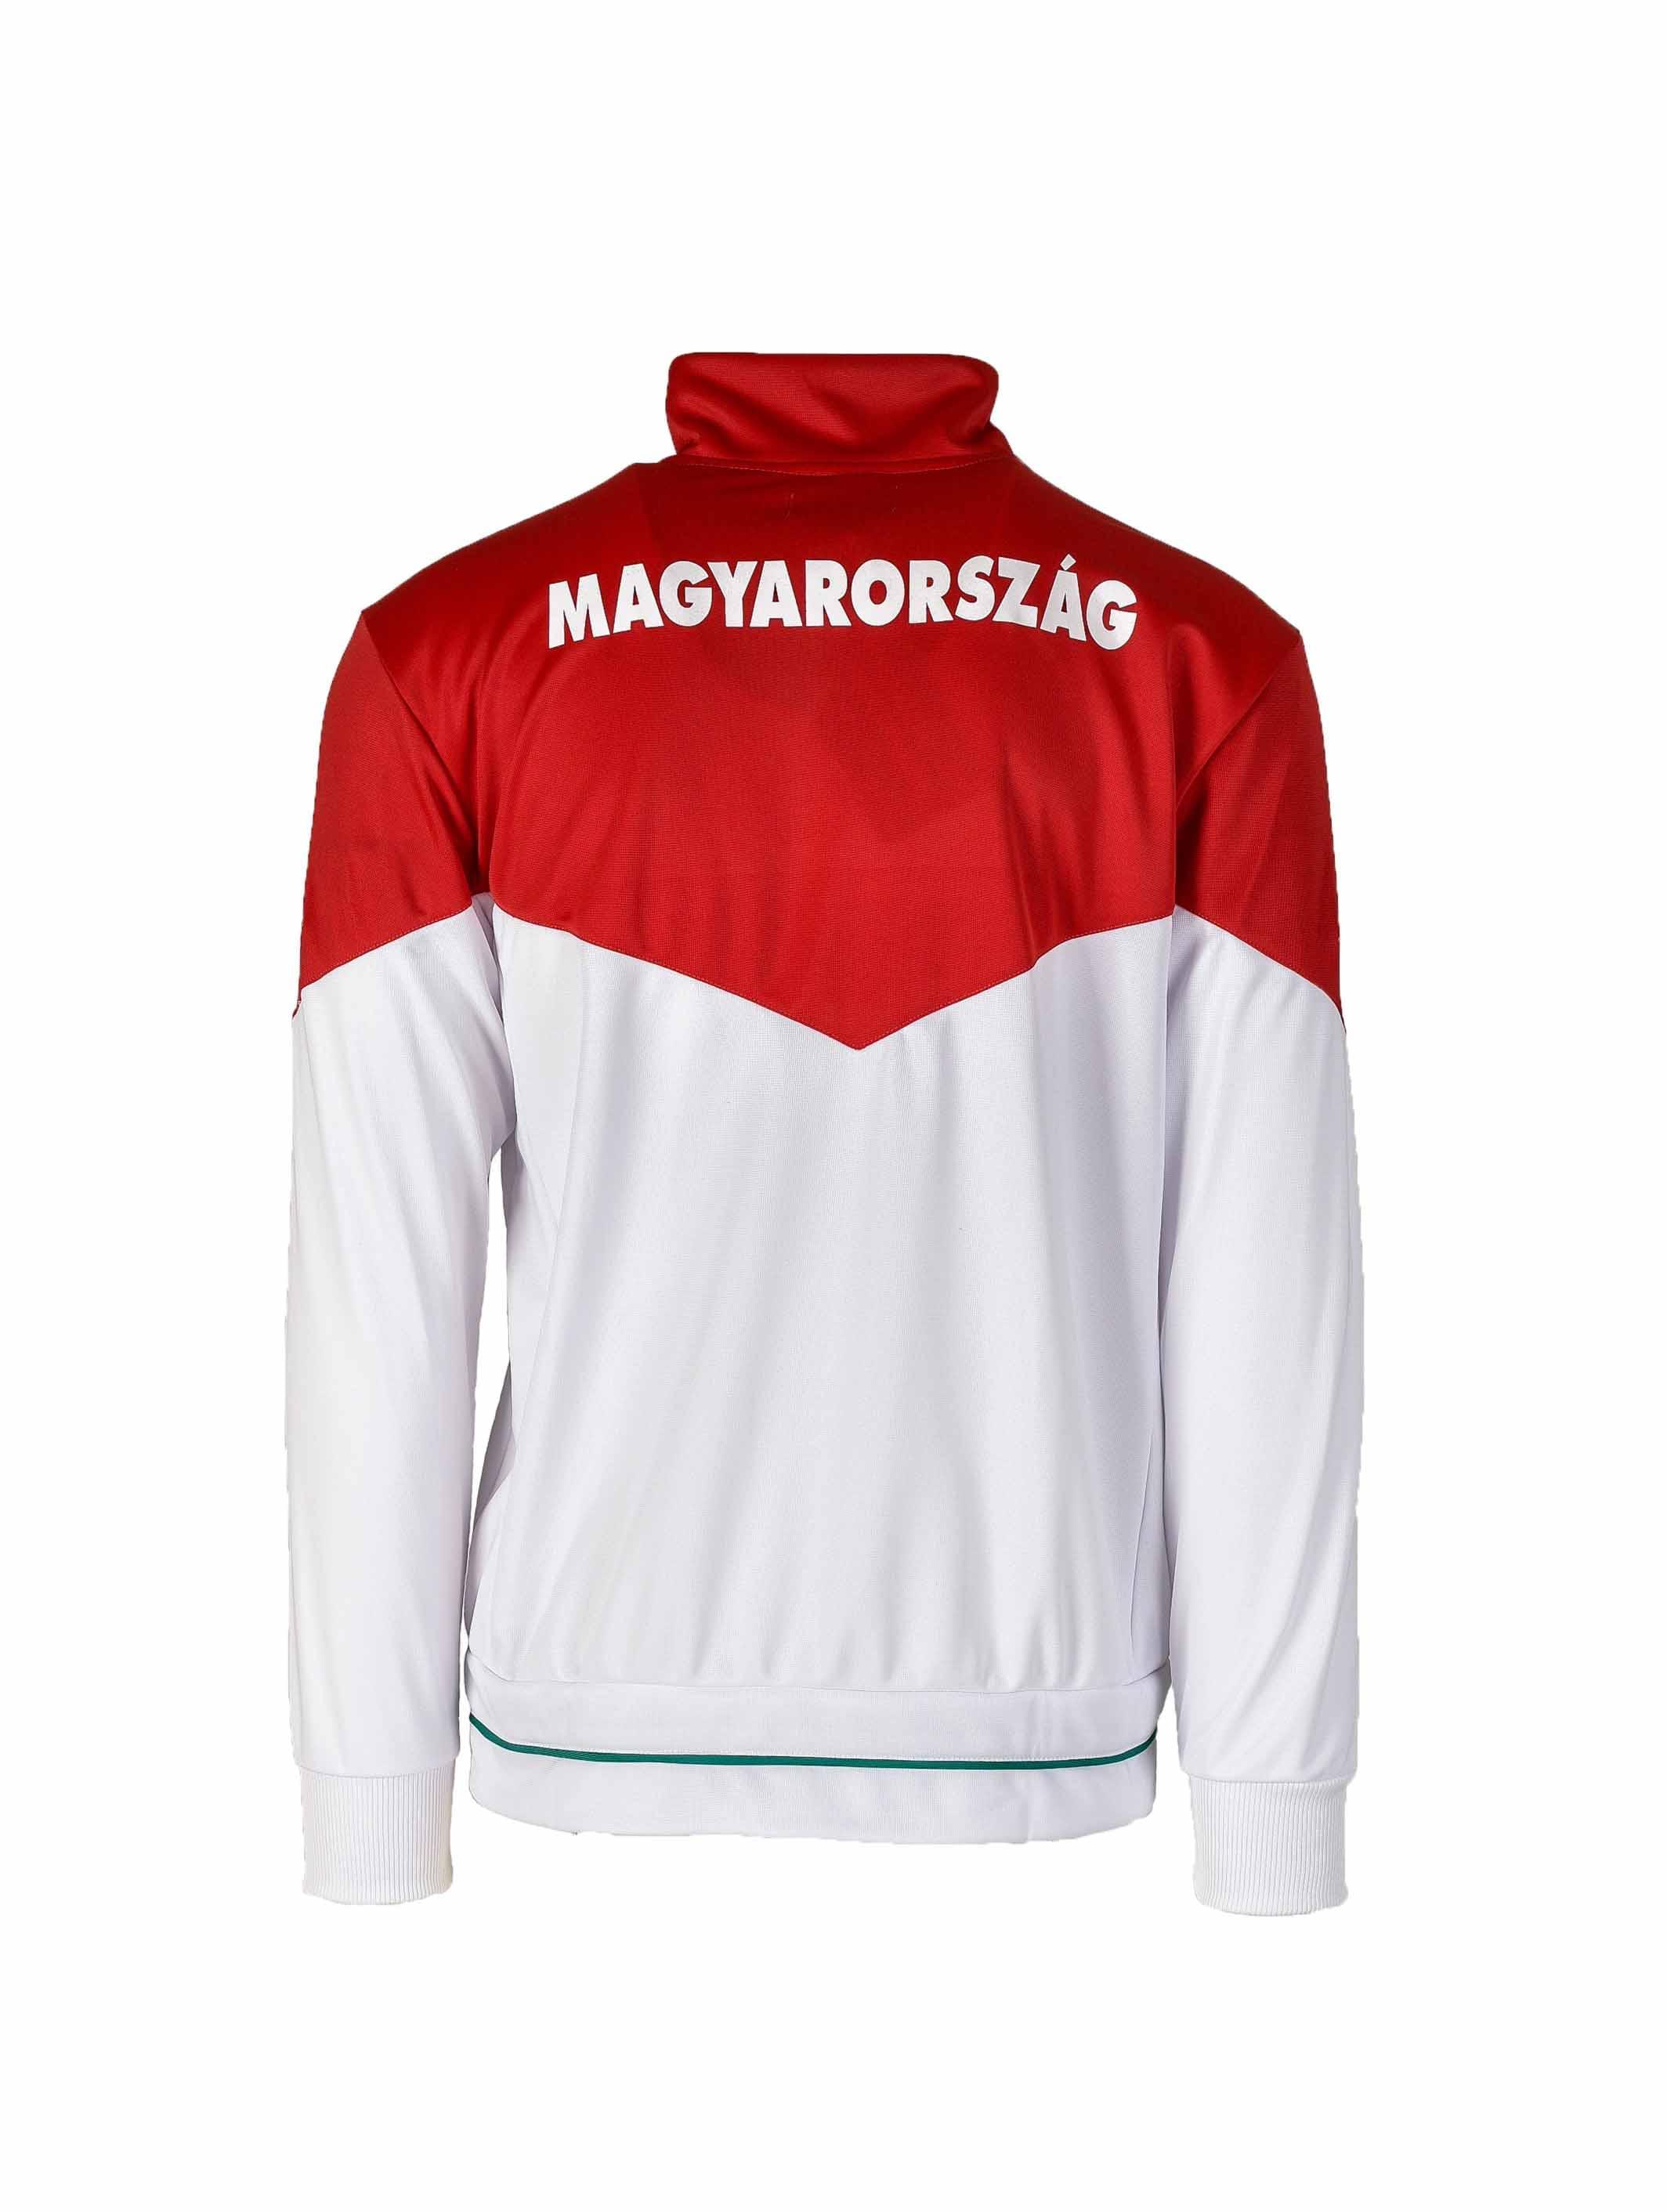 Dorko Hungary MAGYARORORSZÁG JOGGING SWEAT UNI P 7c15177a62